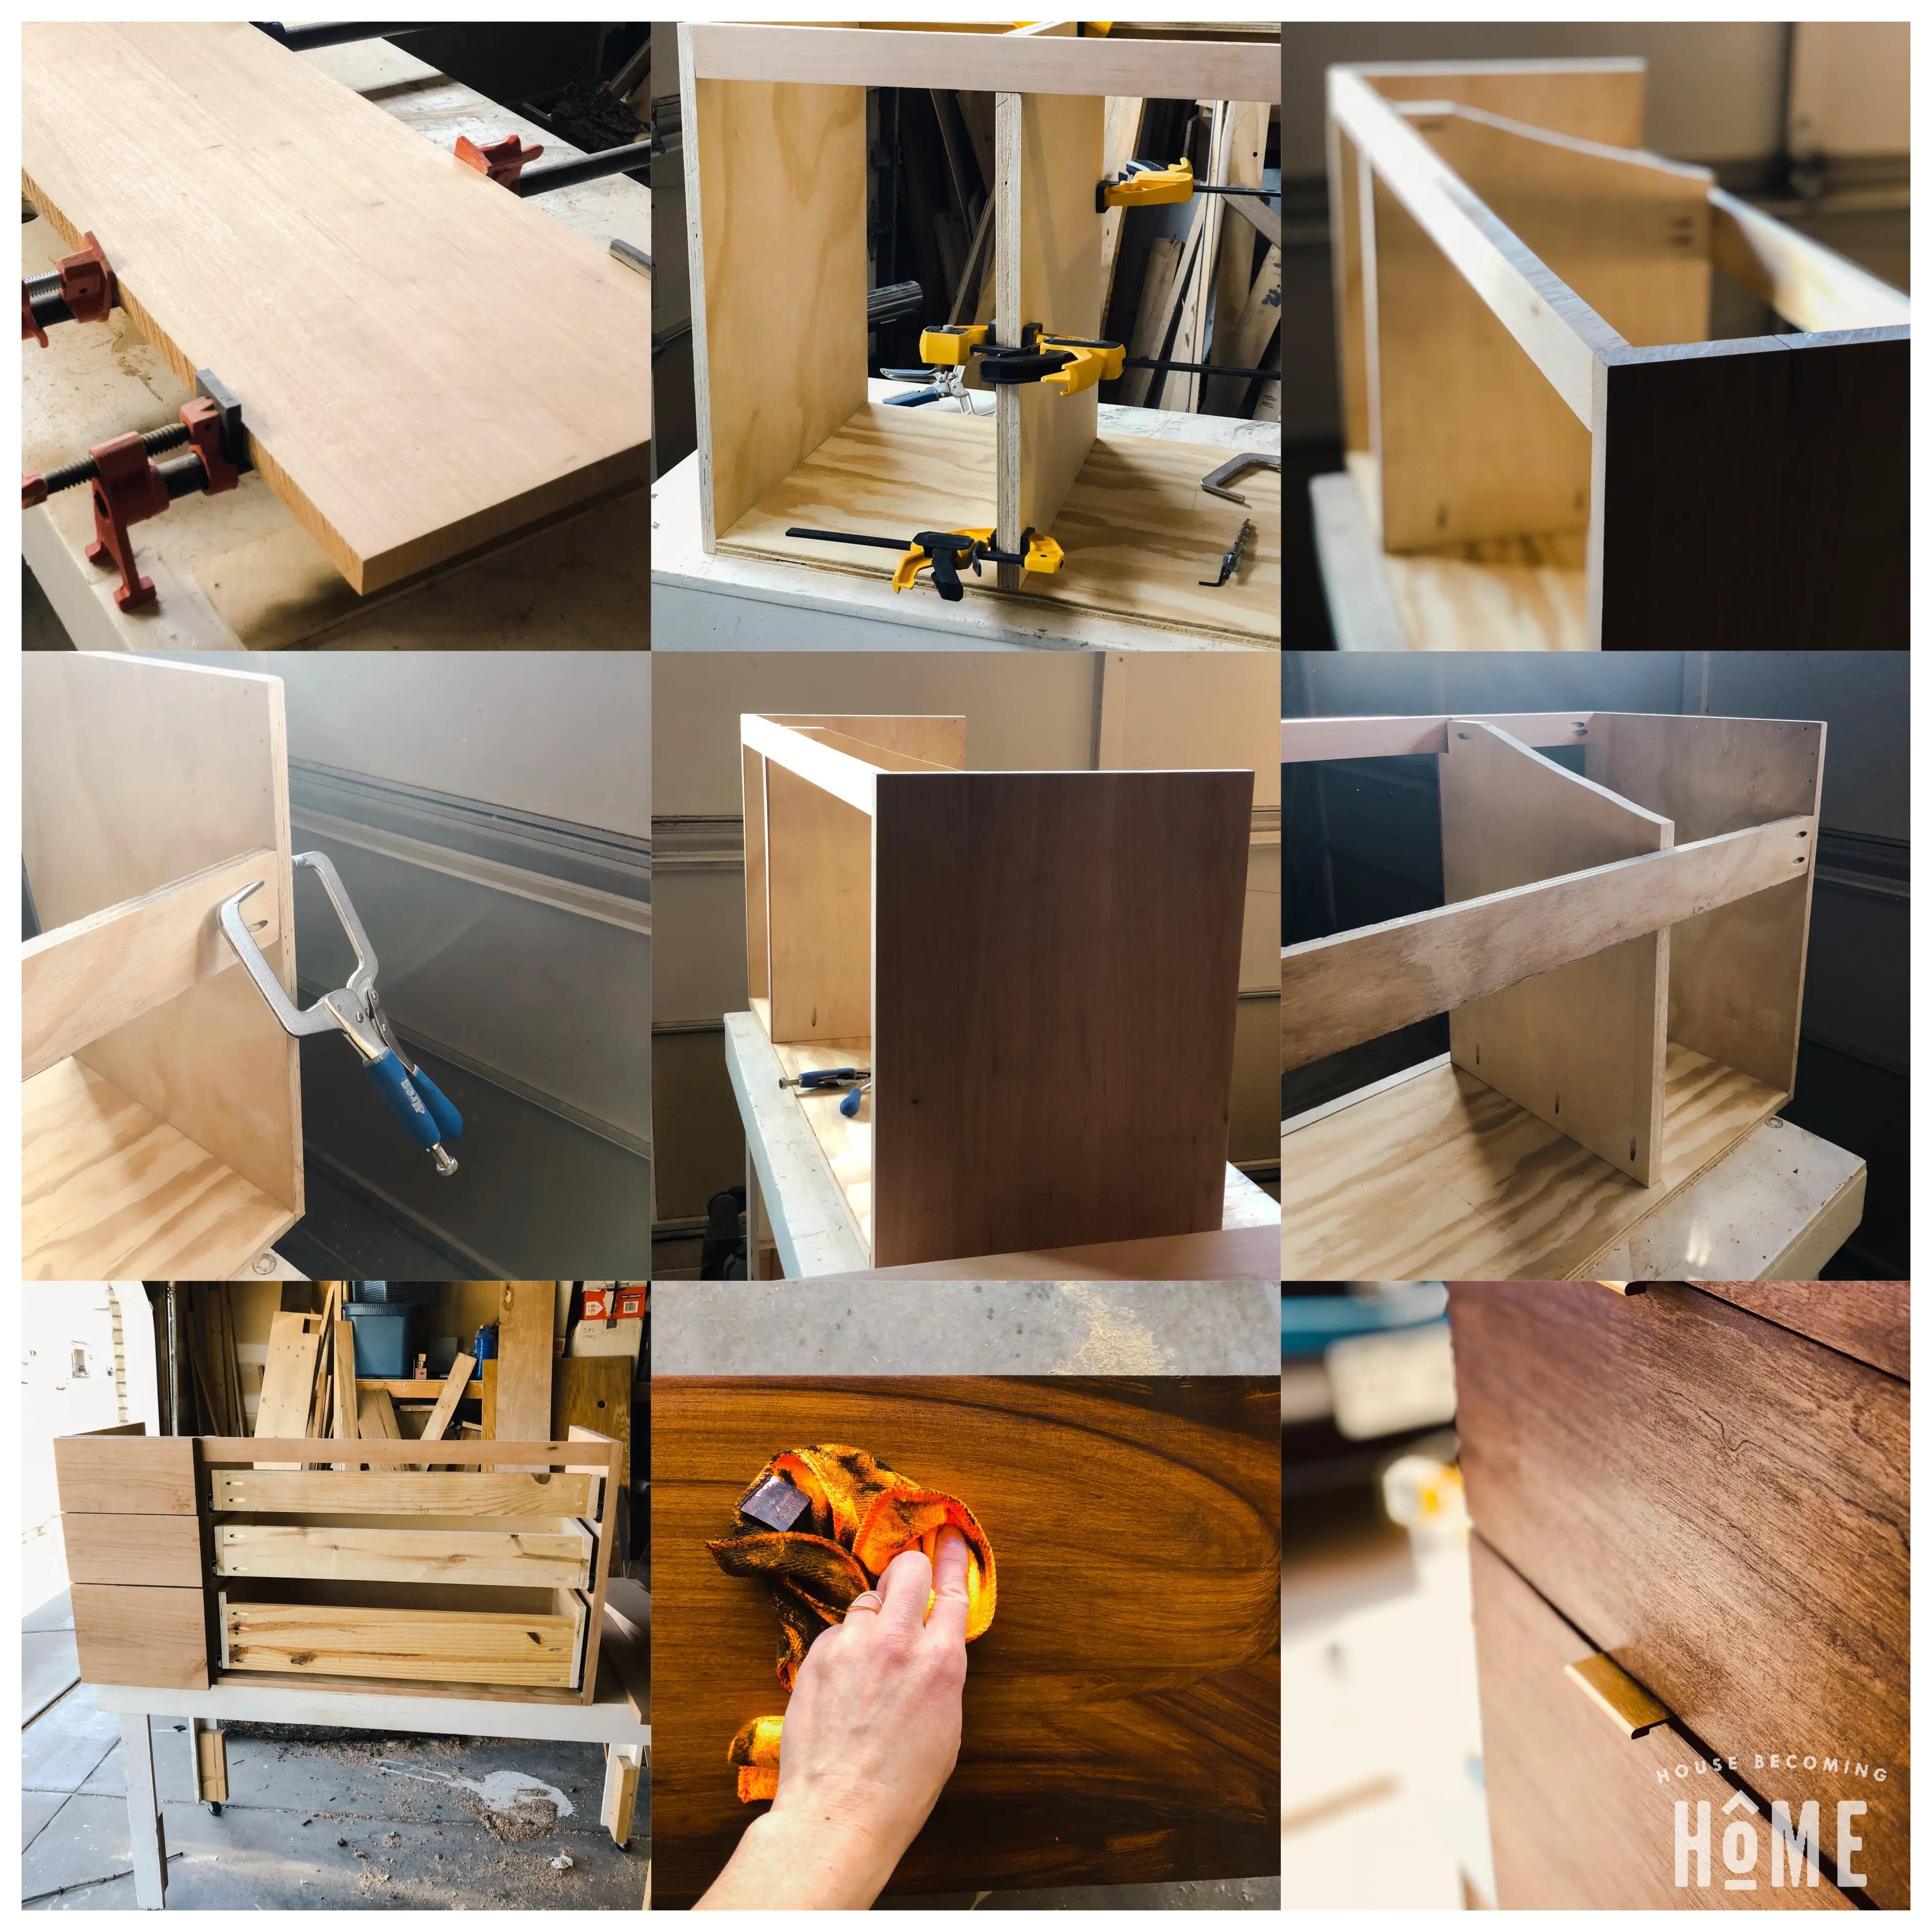 Ikea Odensvik Sink Vanity Plans Build Process